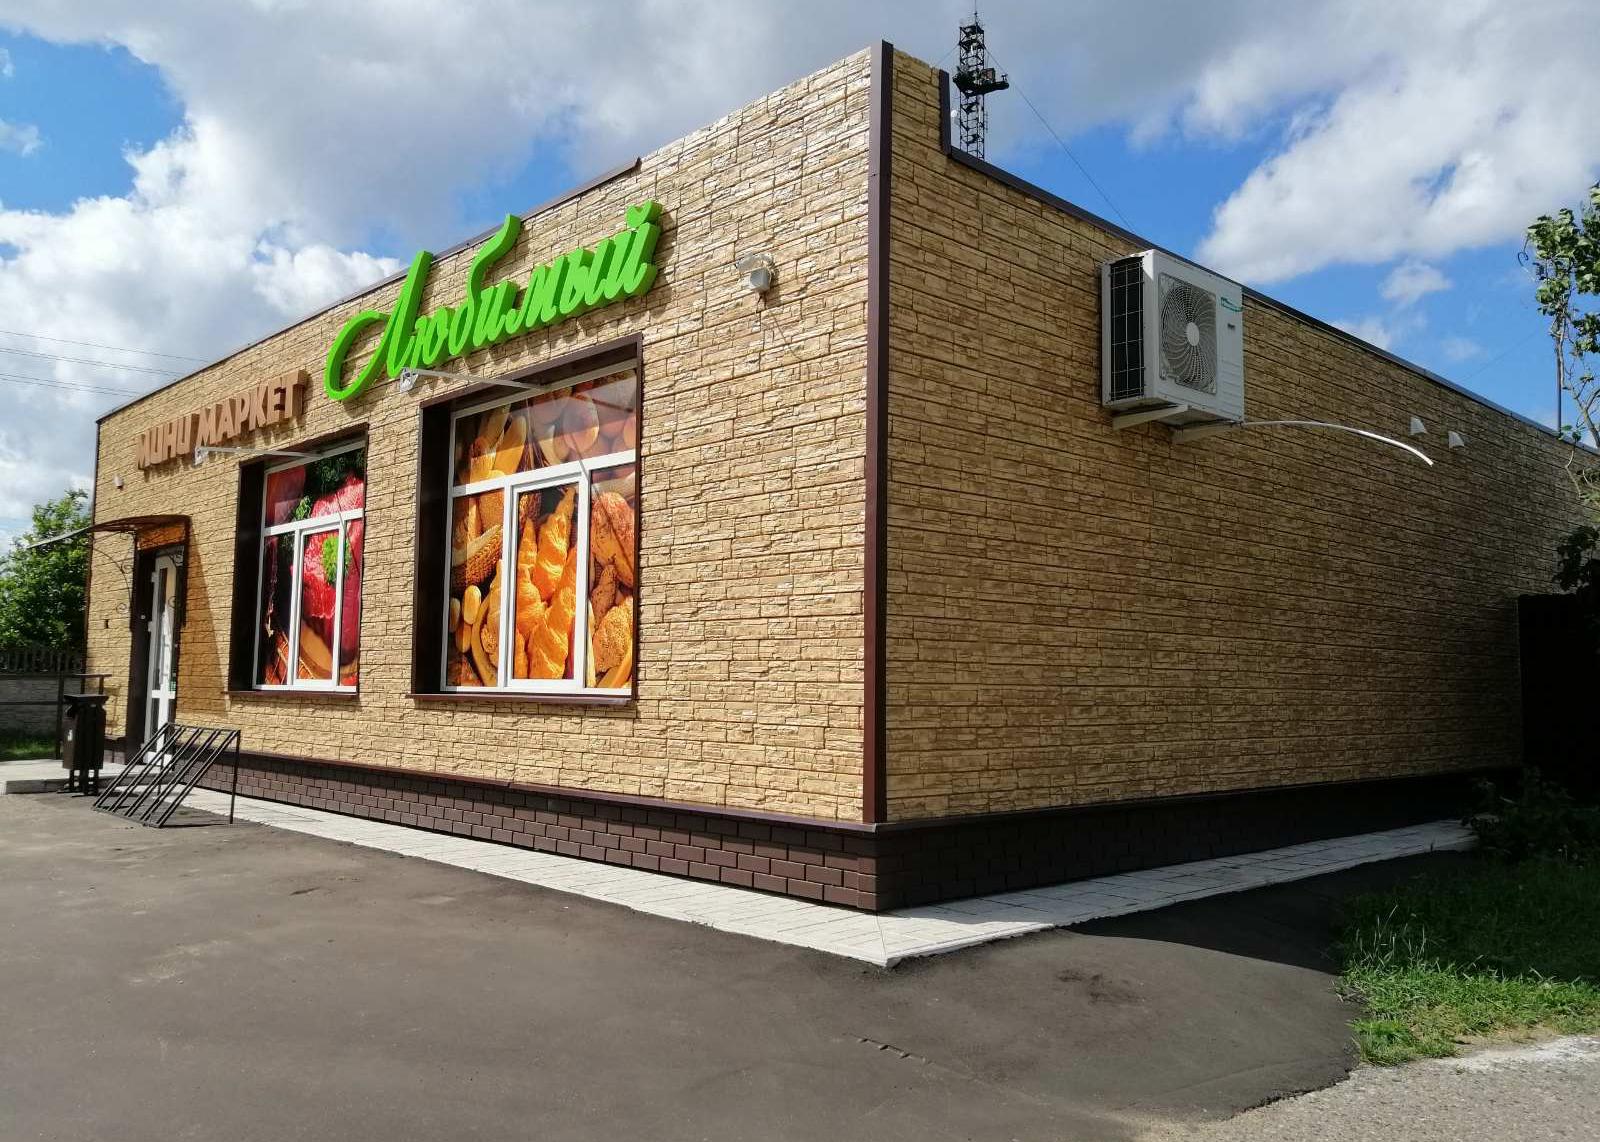 ПВХ сайдинг Я-Фасад, магазин Любимый, д. Коровники